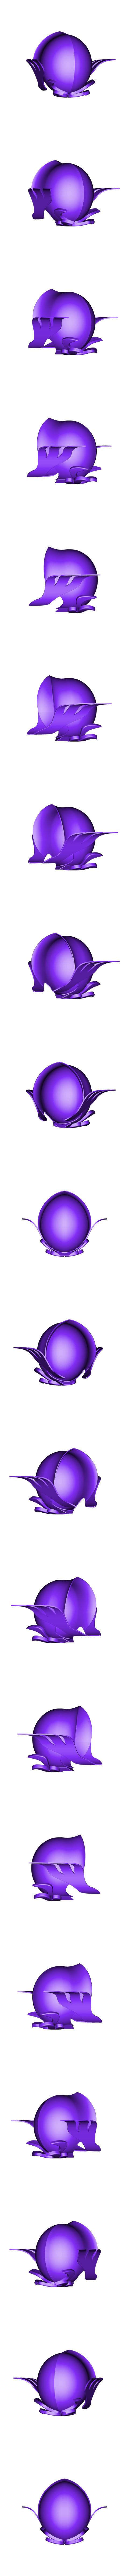 helmetV1.stl Download STL file Libra Armor Helmet // Libra myth cloth helmet • 3D print design, MLBdesign